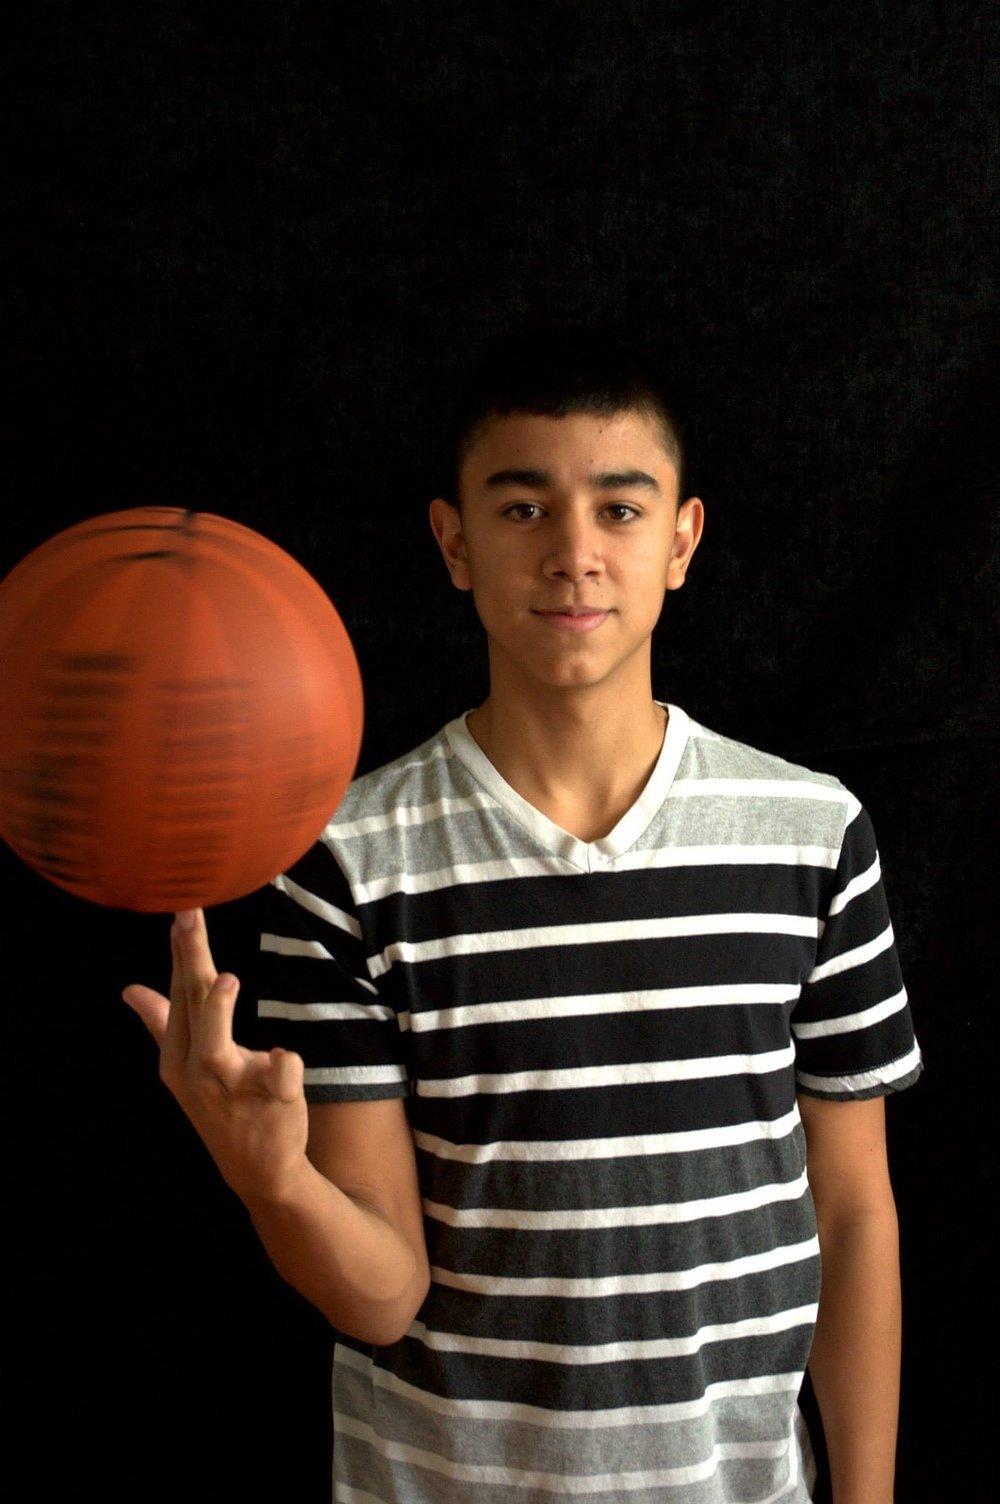 basketball-888531_1920.jpg